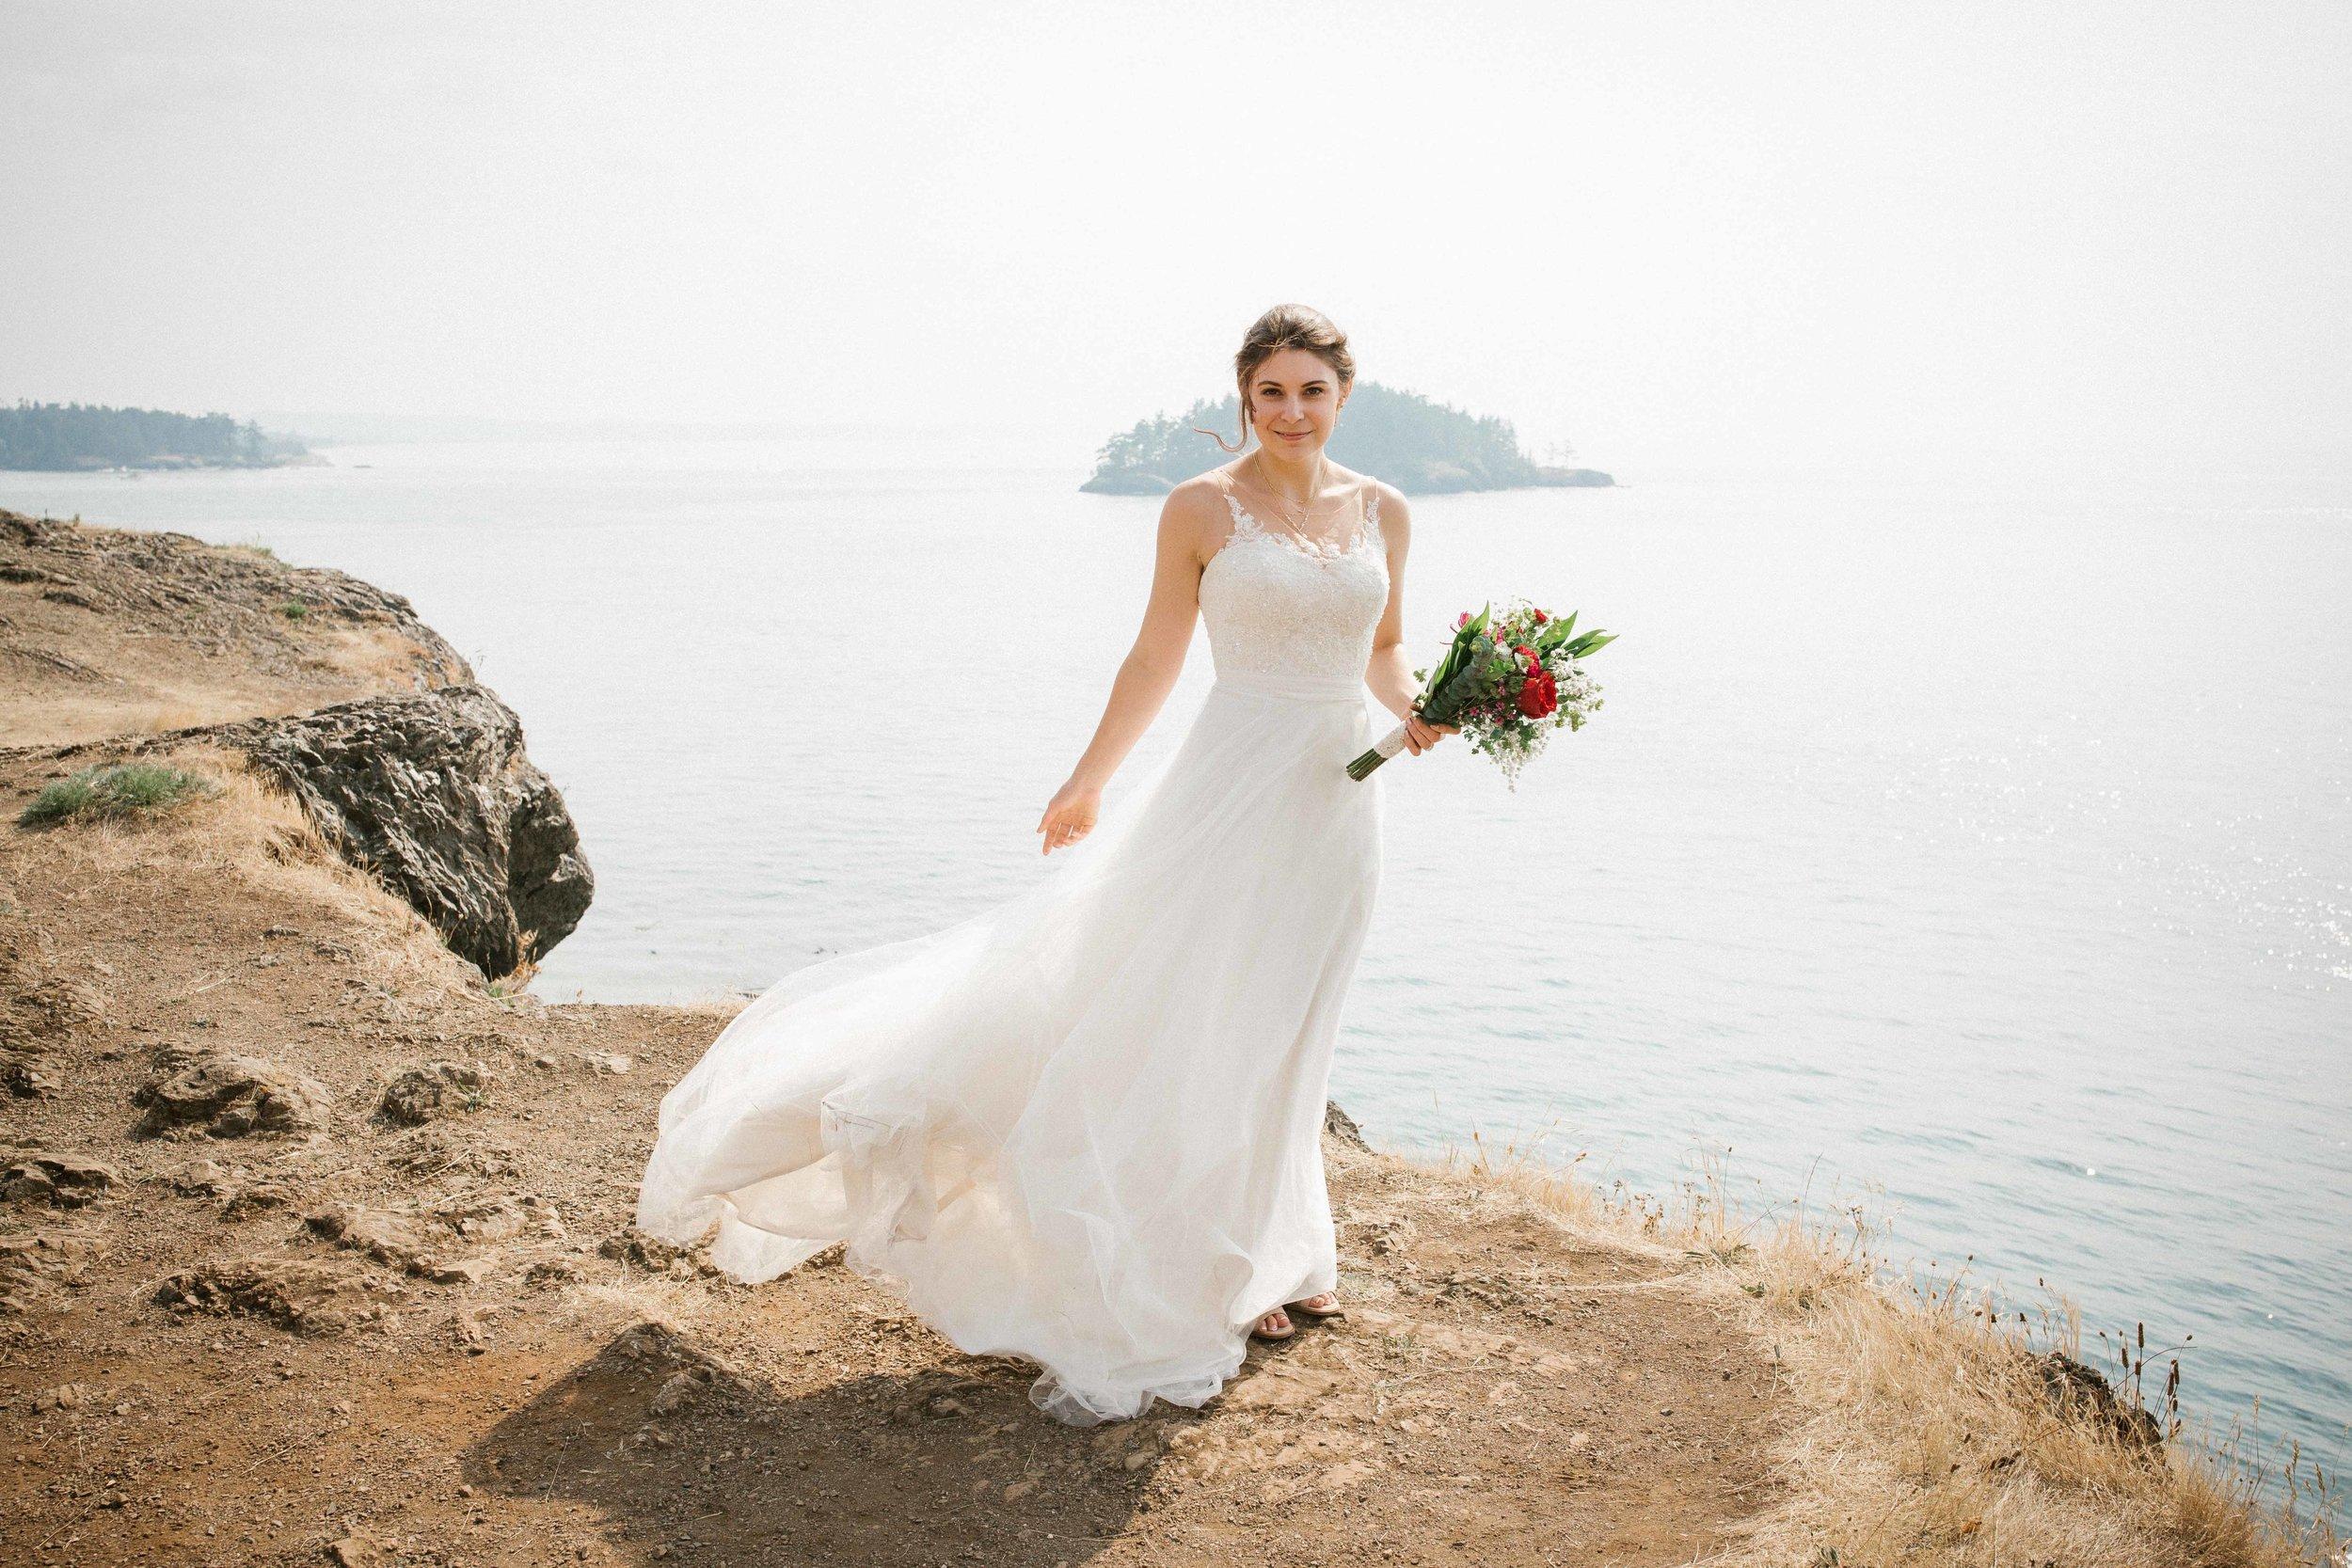 deception-pass-wedding-44.jpg